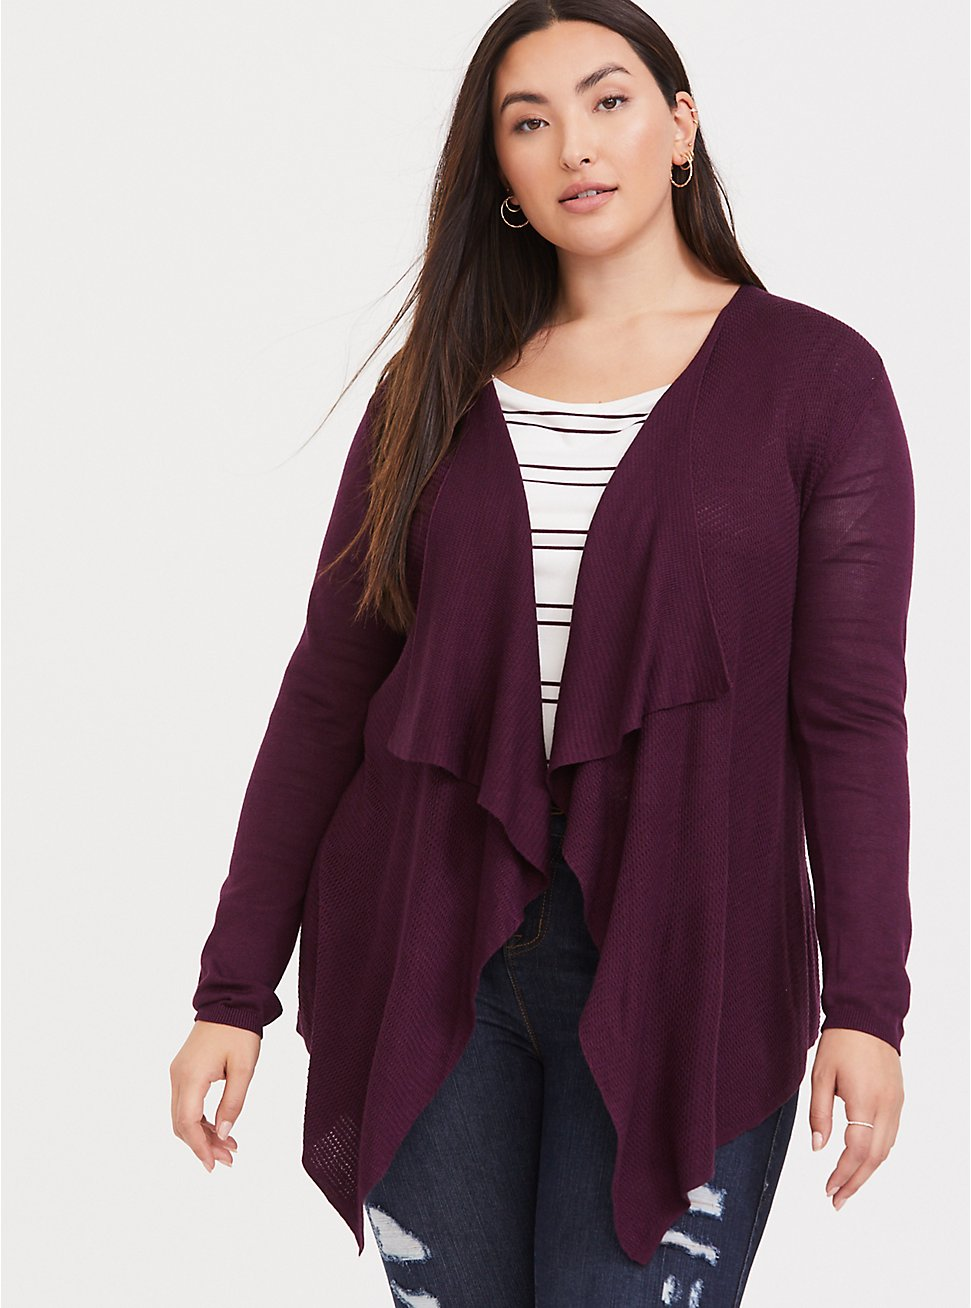 Burgundy Purple Draped Open Front Cardigan, HIGHLAND THISTLE, hi-res